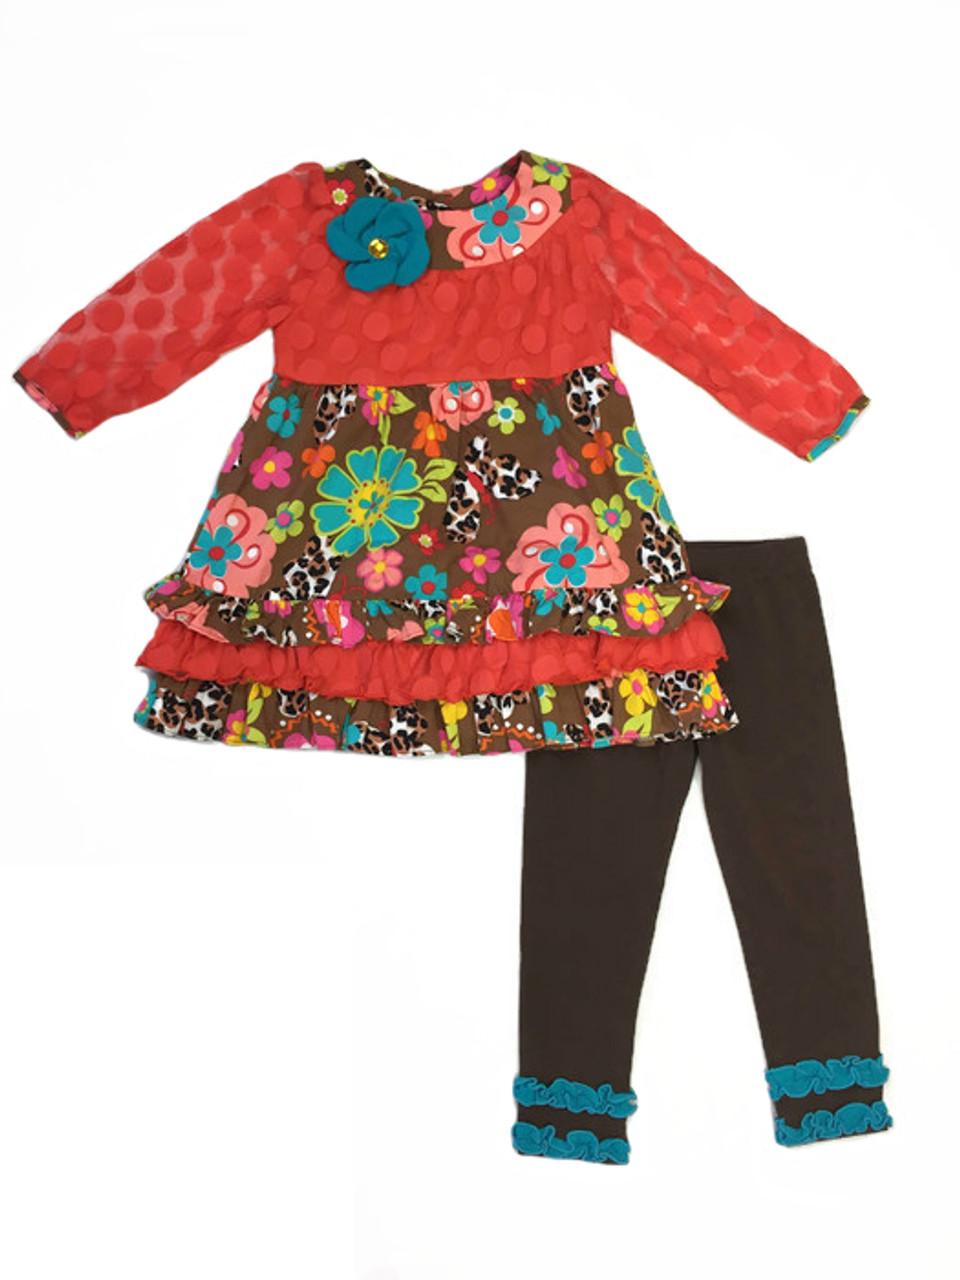 e90a99ed4fc18 Rare Editions Girls Matching Set | Berri Kids Resale Boutique